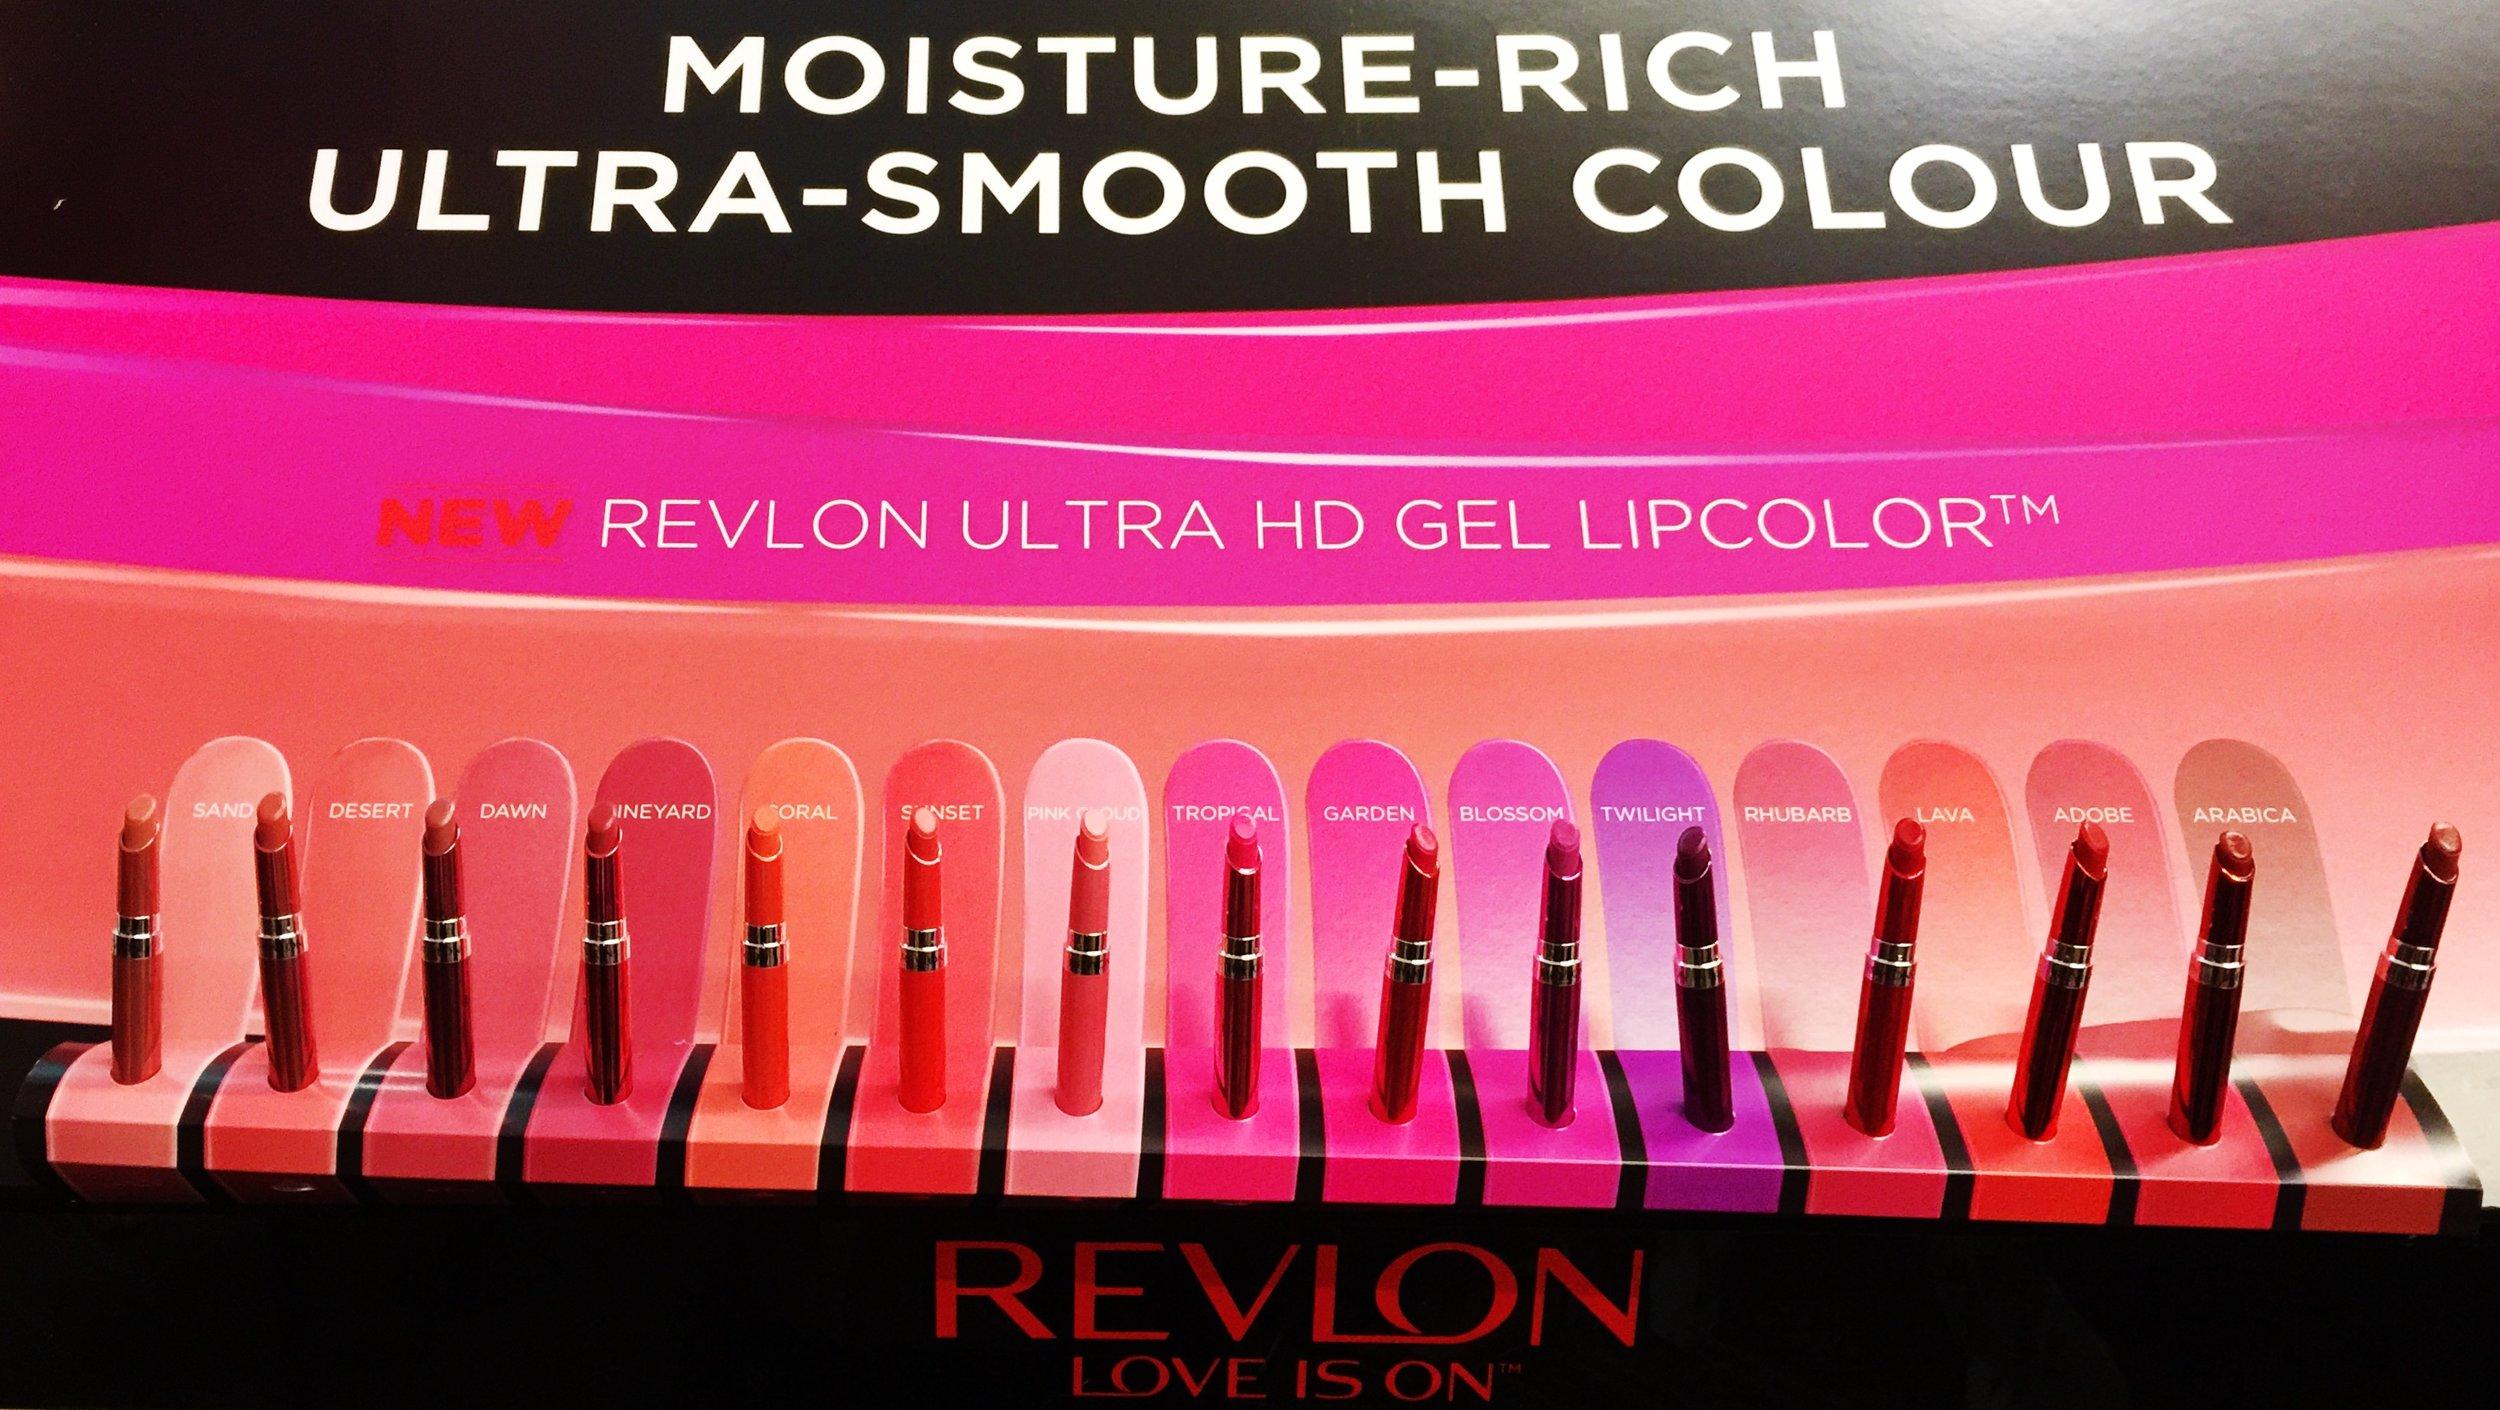 Marisa Robinson Beauty Blogger Priceline: The Beauty Prescription Event 2017 Revlon